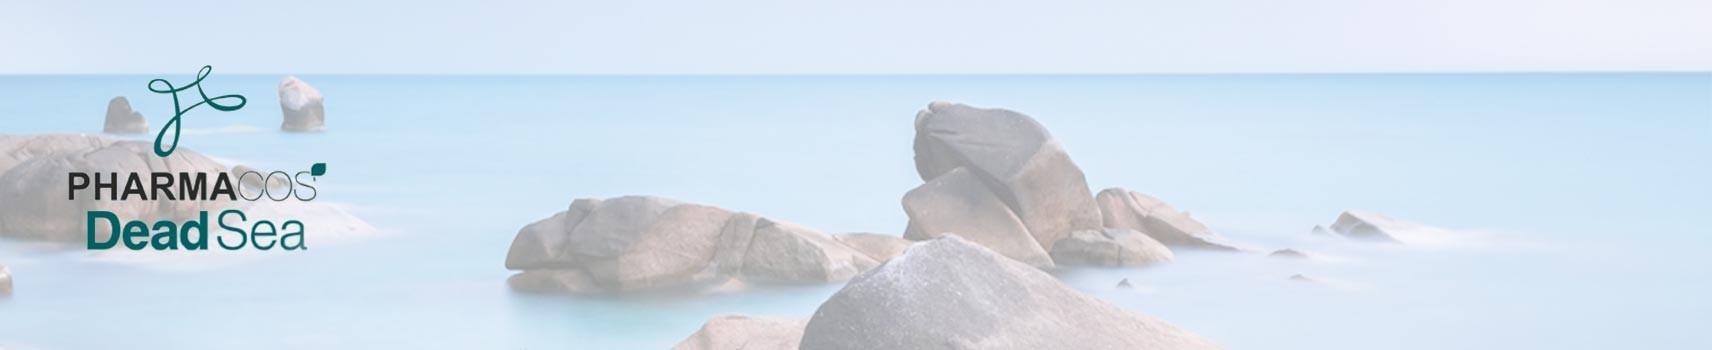 PHARMACOS DEAD SEA, АПТЕЧНАЯ КОСМЕТИКА МЕРТВОГО МОРЯ